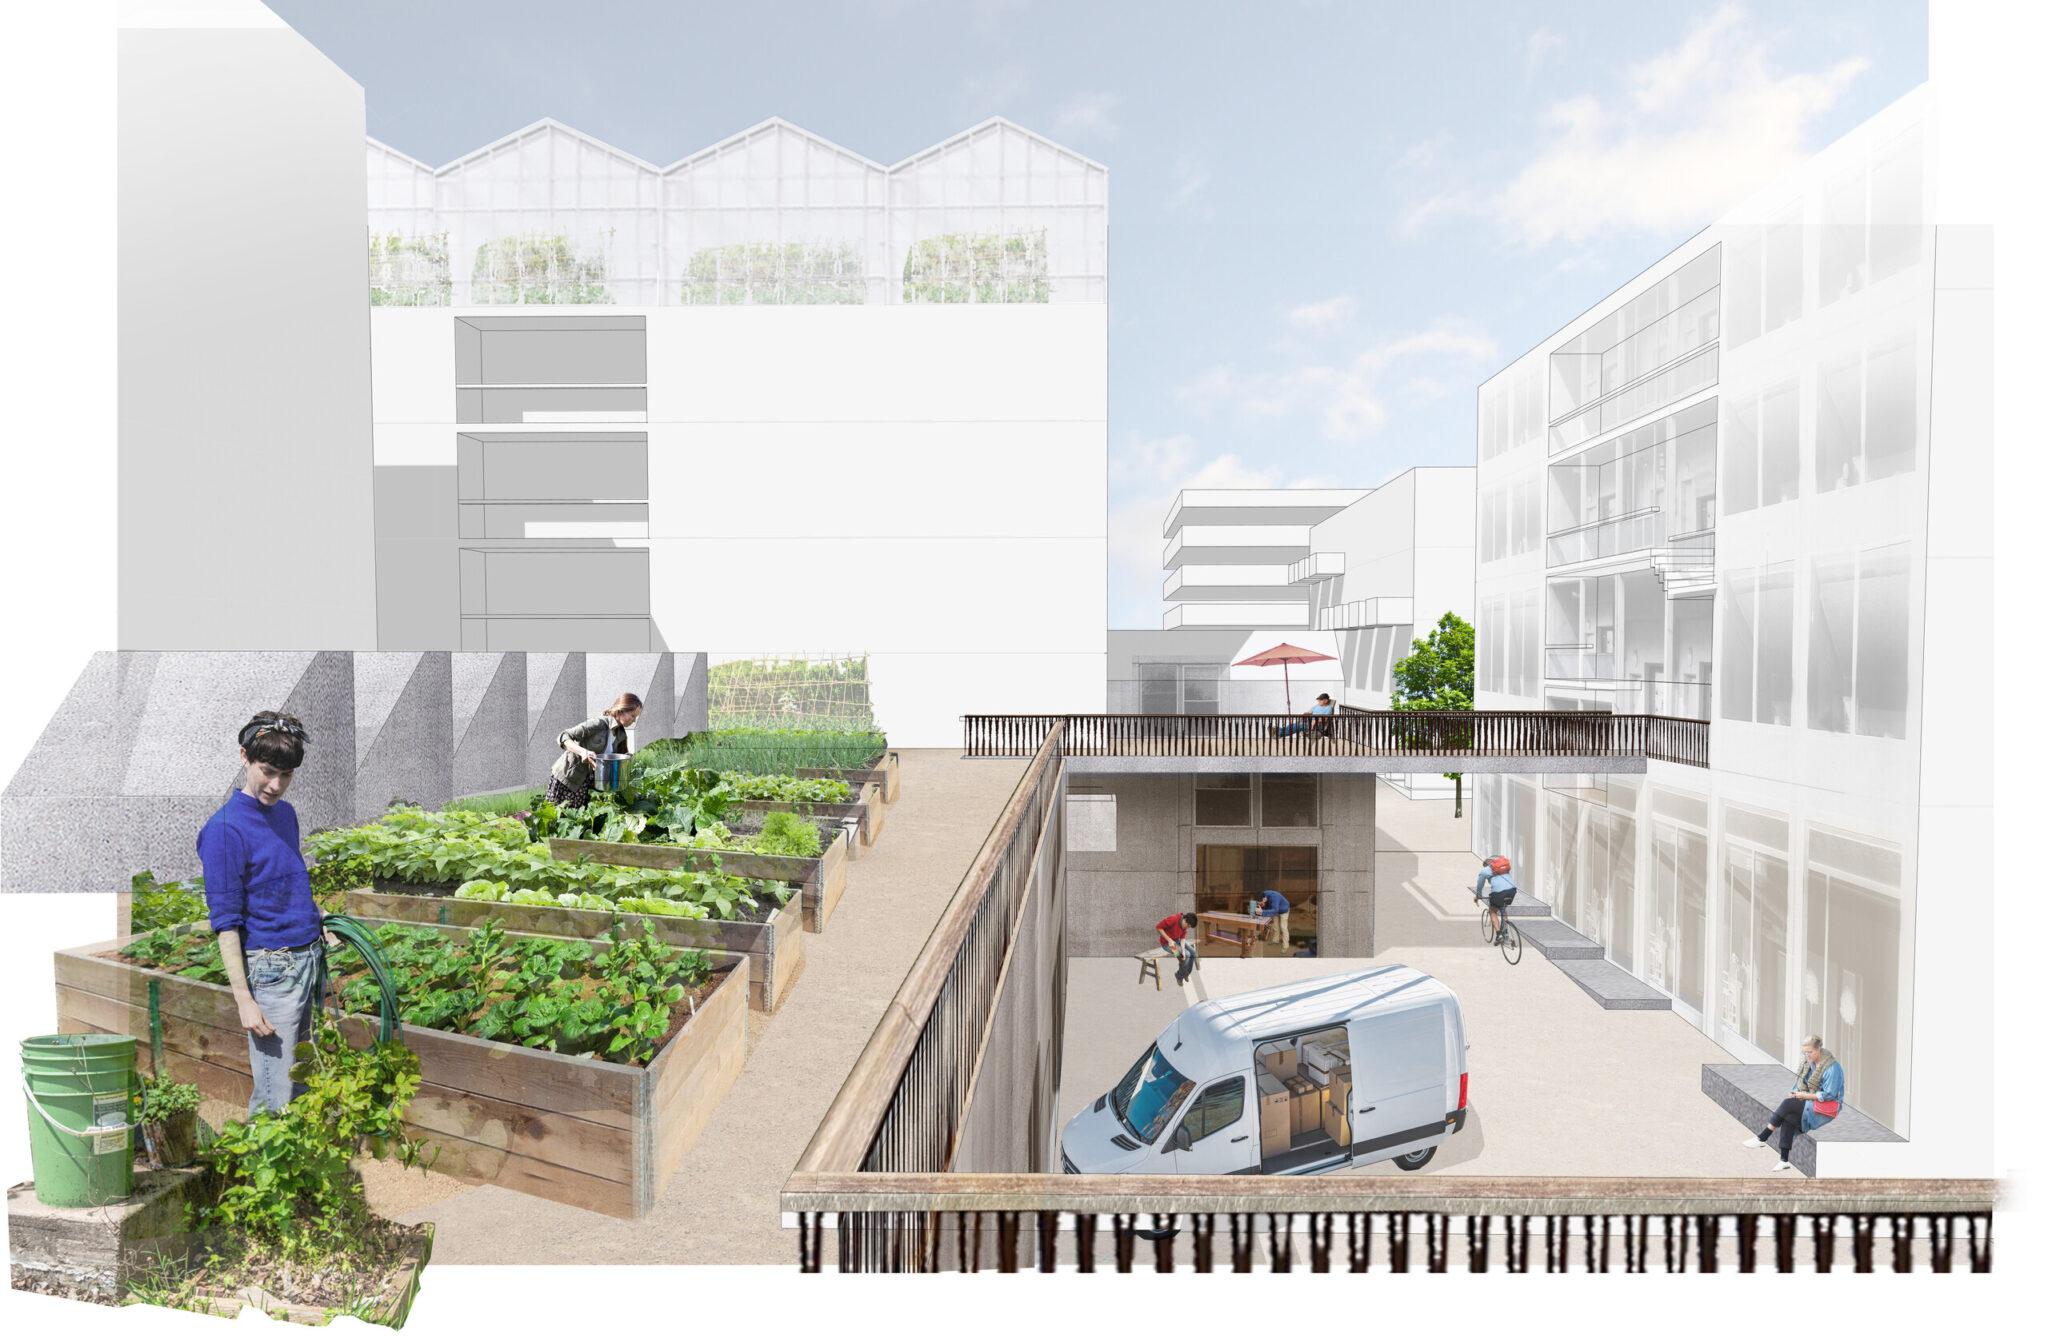 Credits: JOTT architecture & urbanism GbR